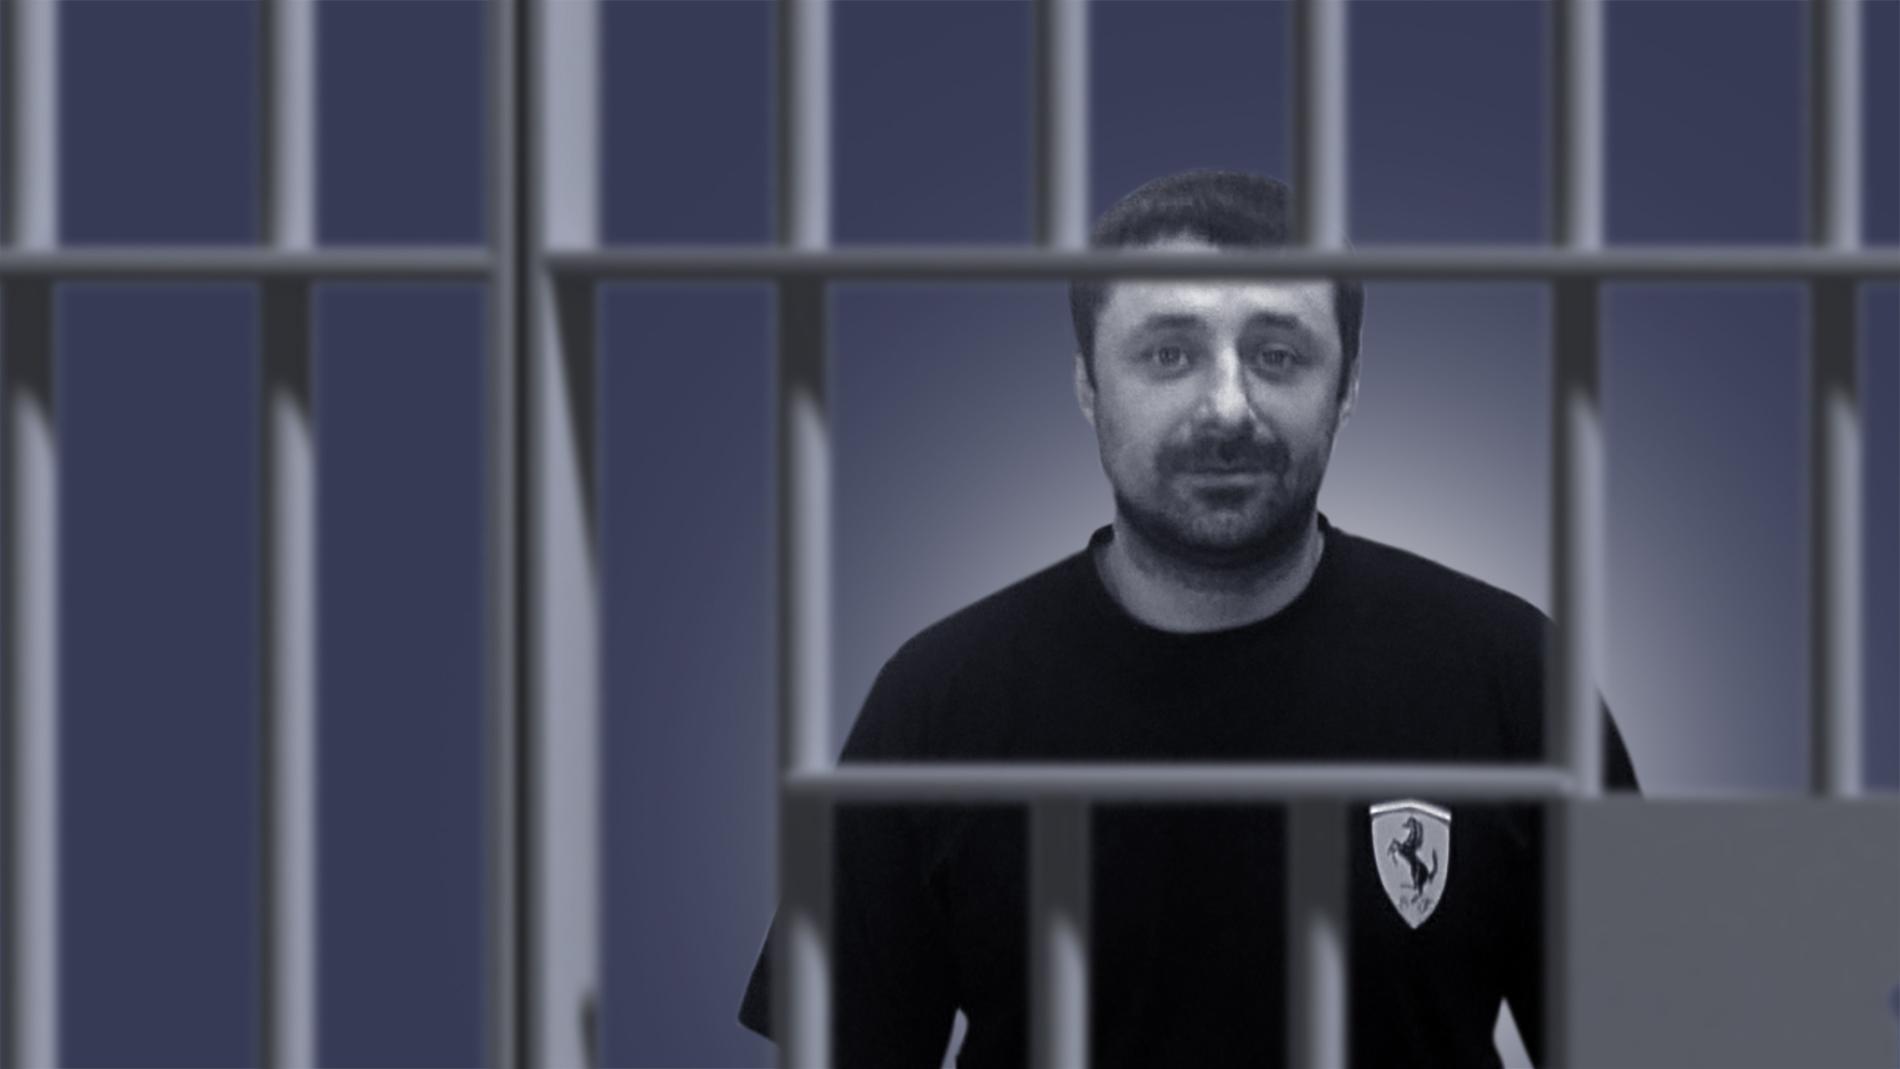 "<p>Коллаж © LIFE. Фото ©<a href=""https://www.primecrime.ru/photo/5147/"" target=""_blank"" rel=""noopener noreferrer"">Primecrime.ru</a></p>"